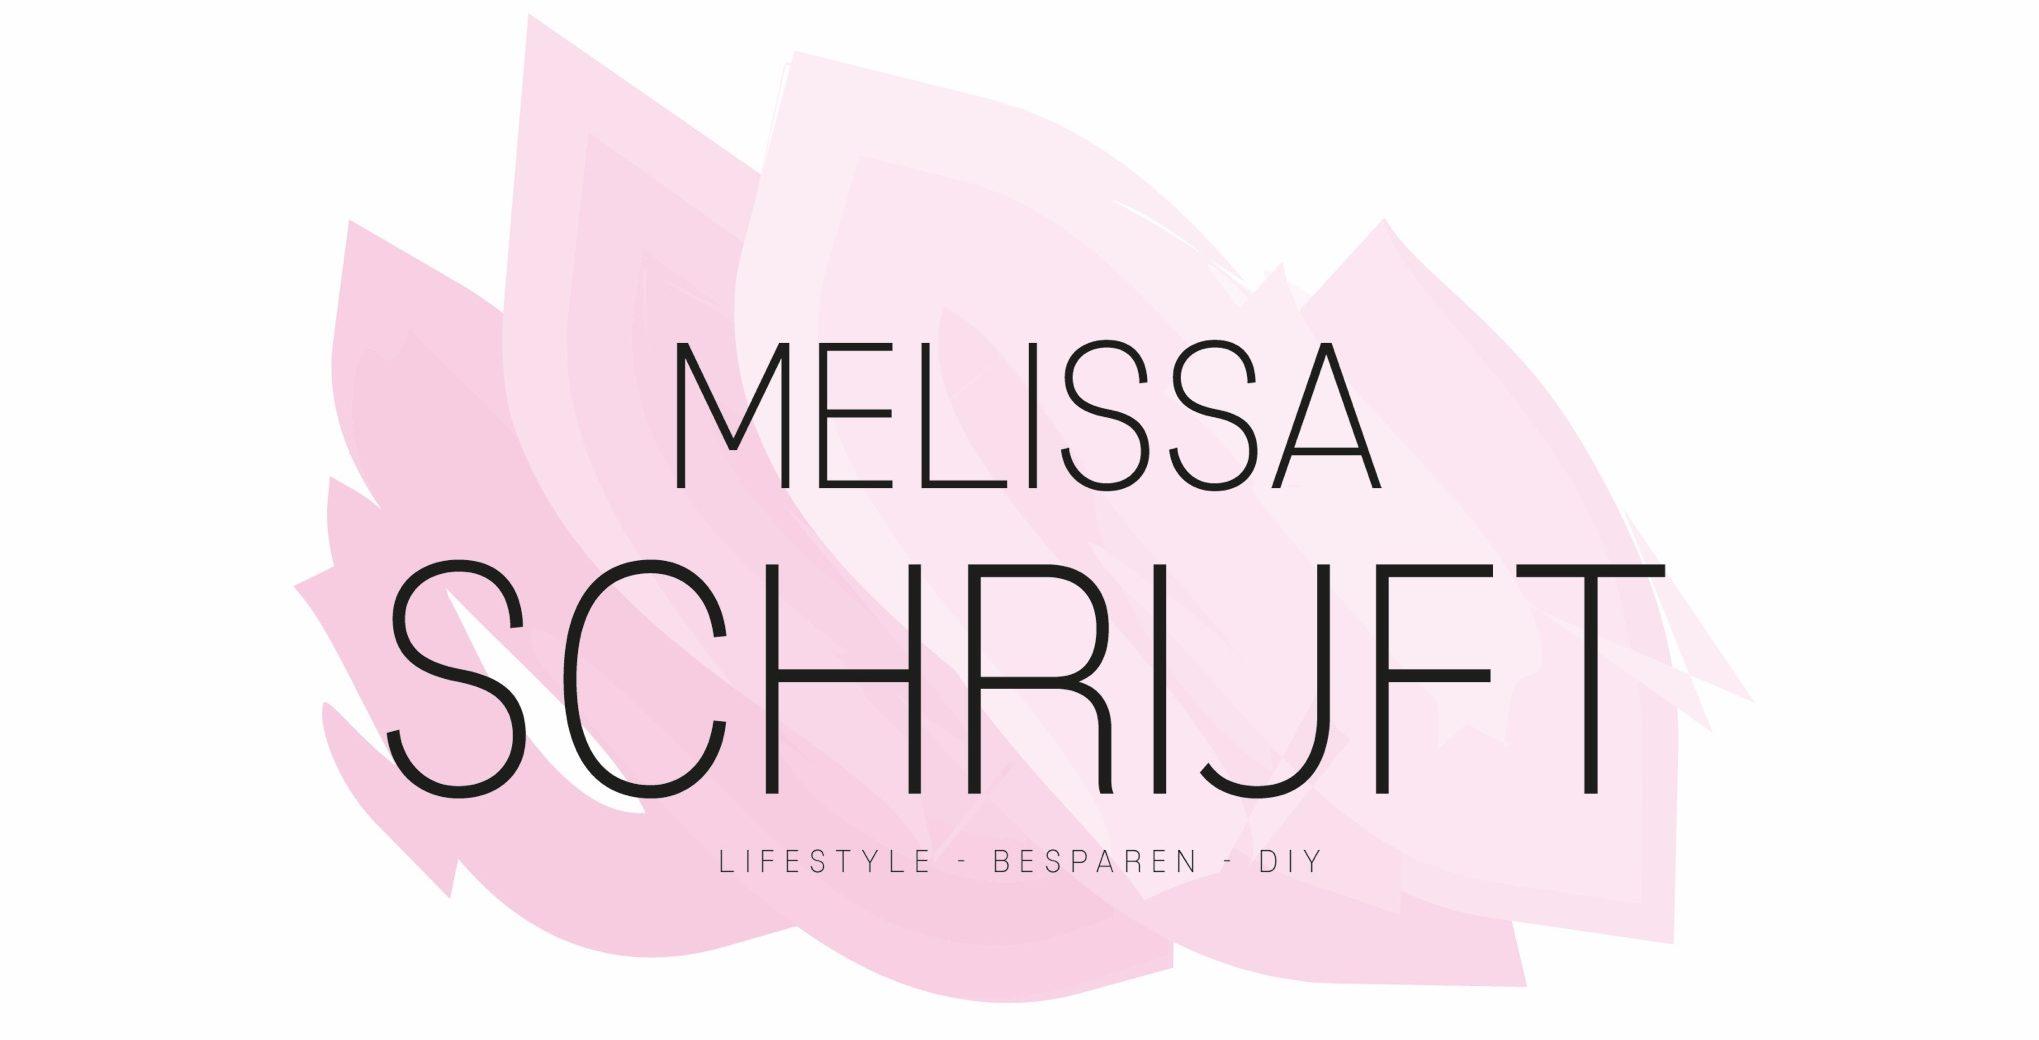 Melissaschrijft